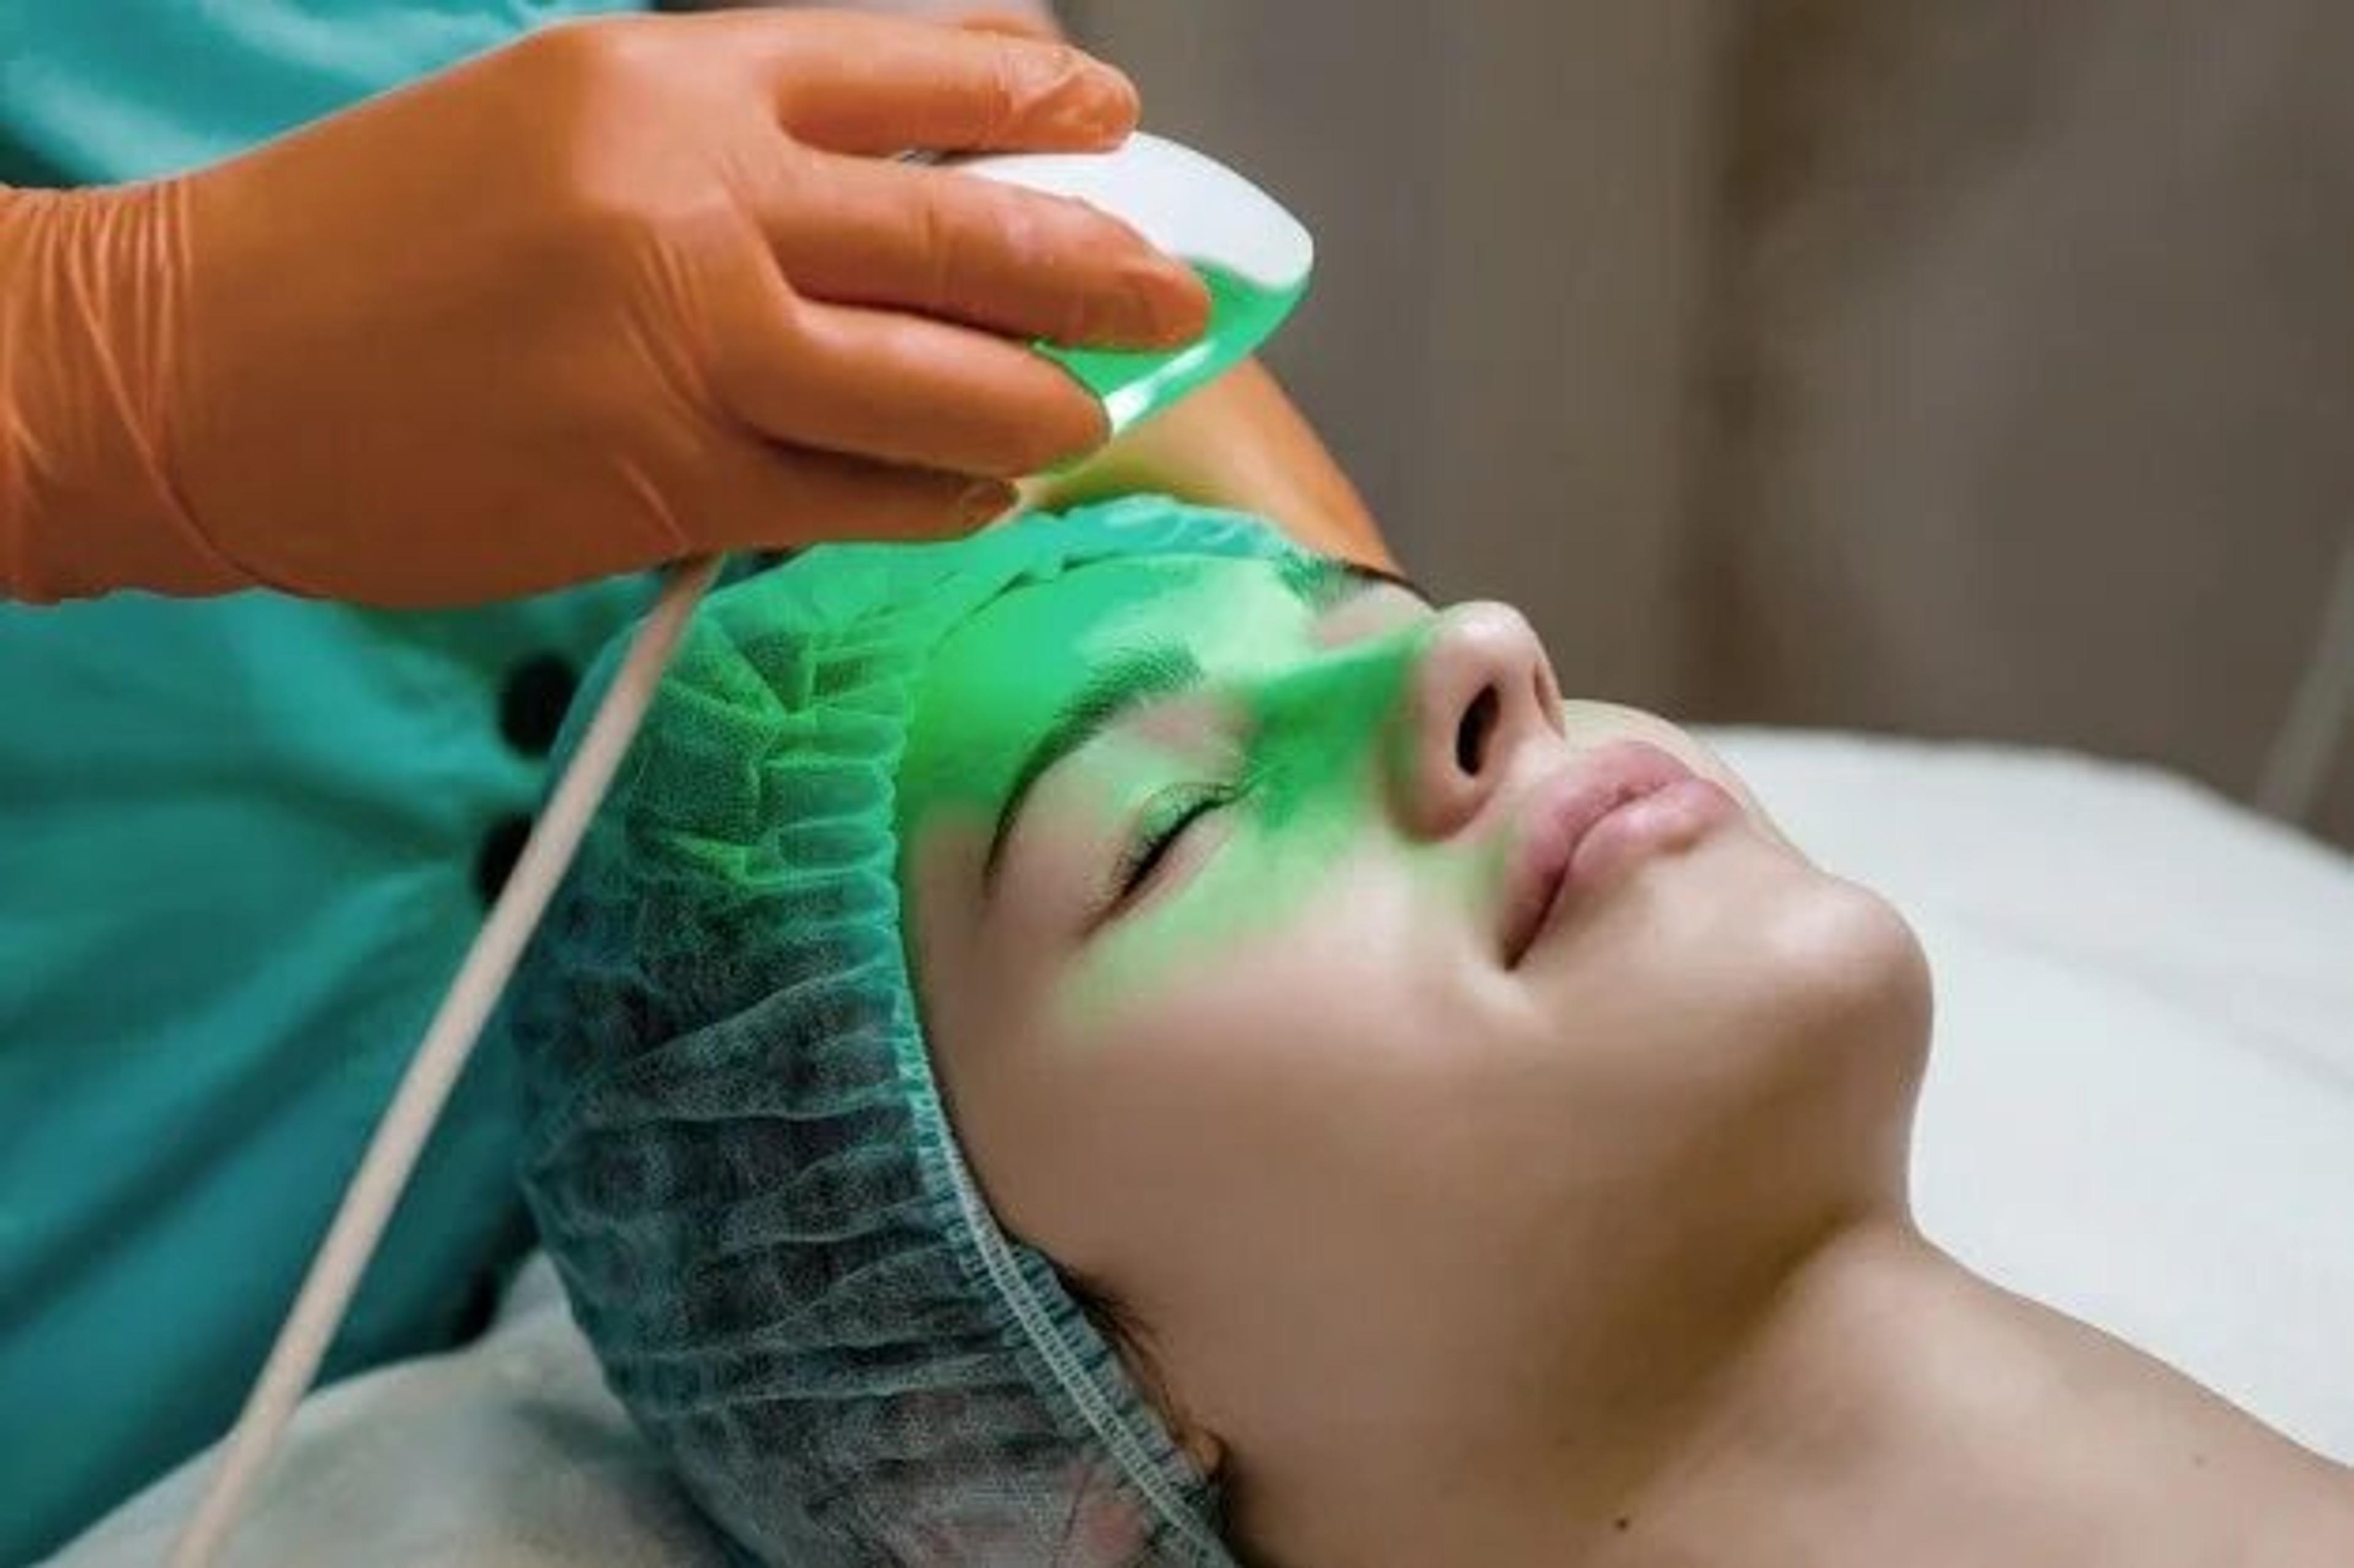 Patient receiving Light Stim treatment